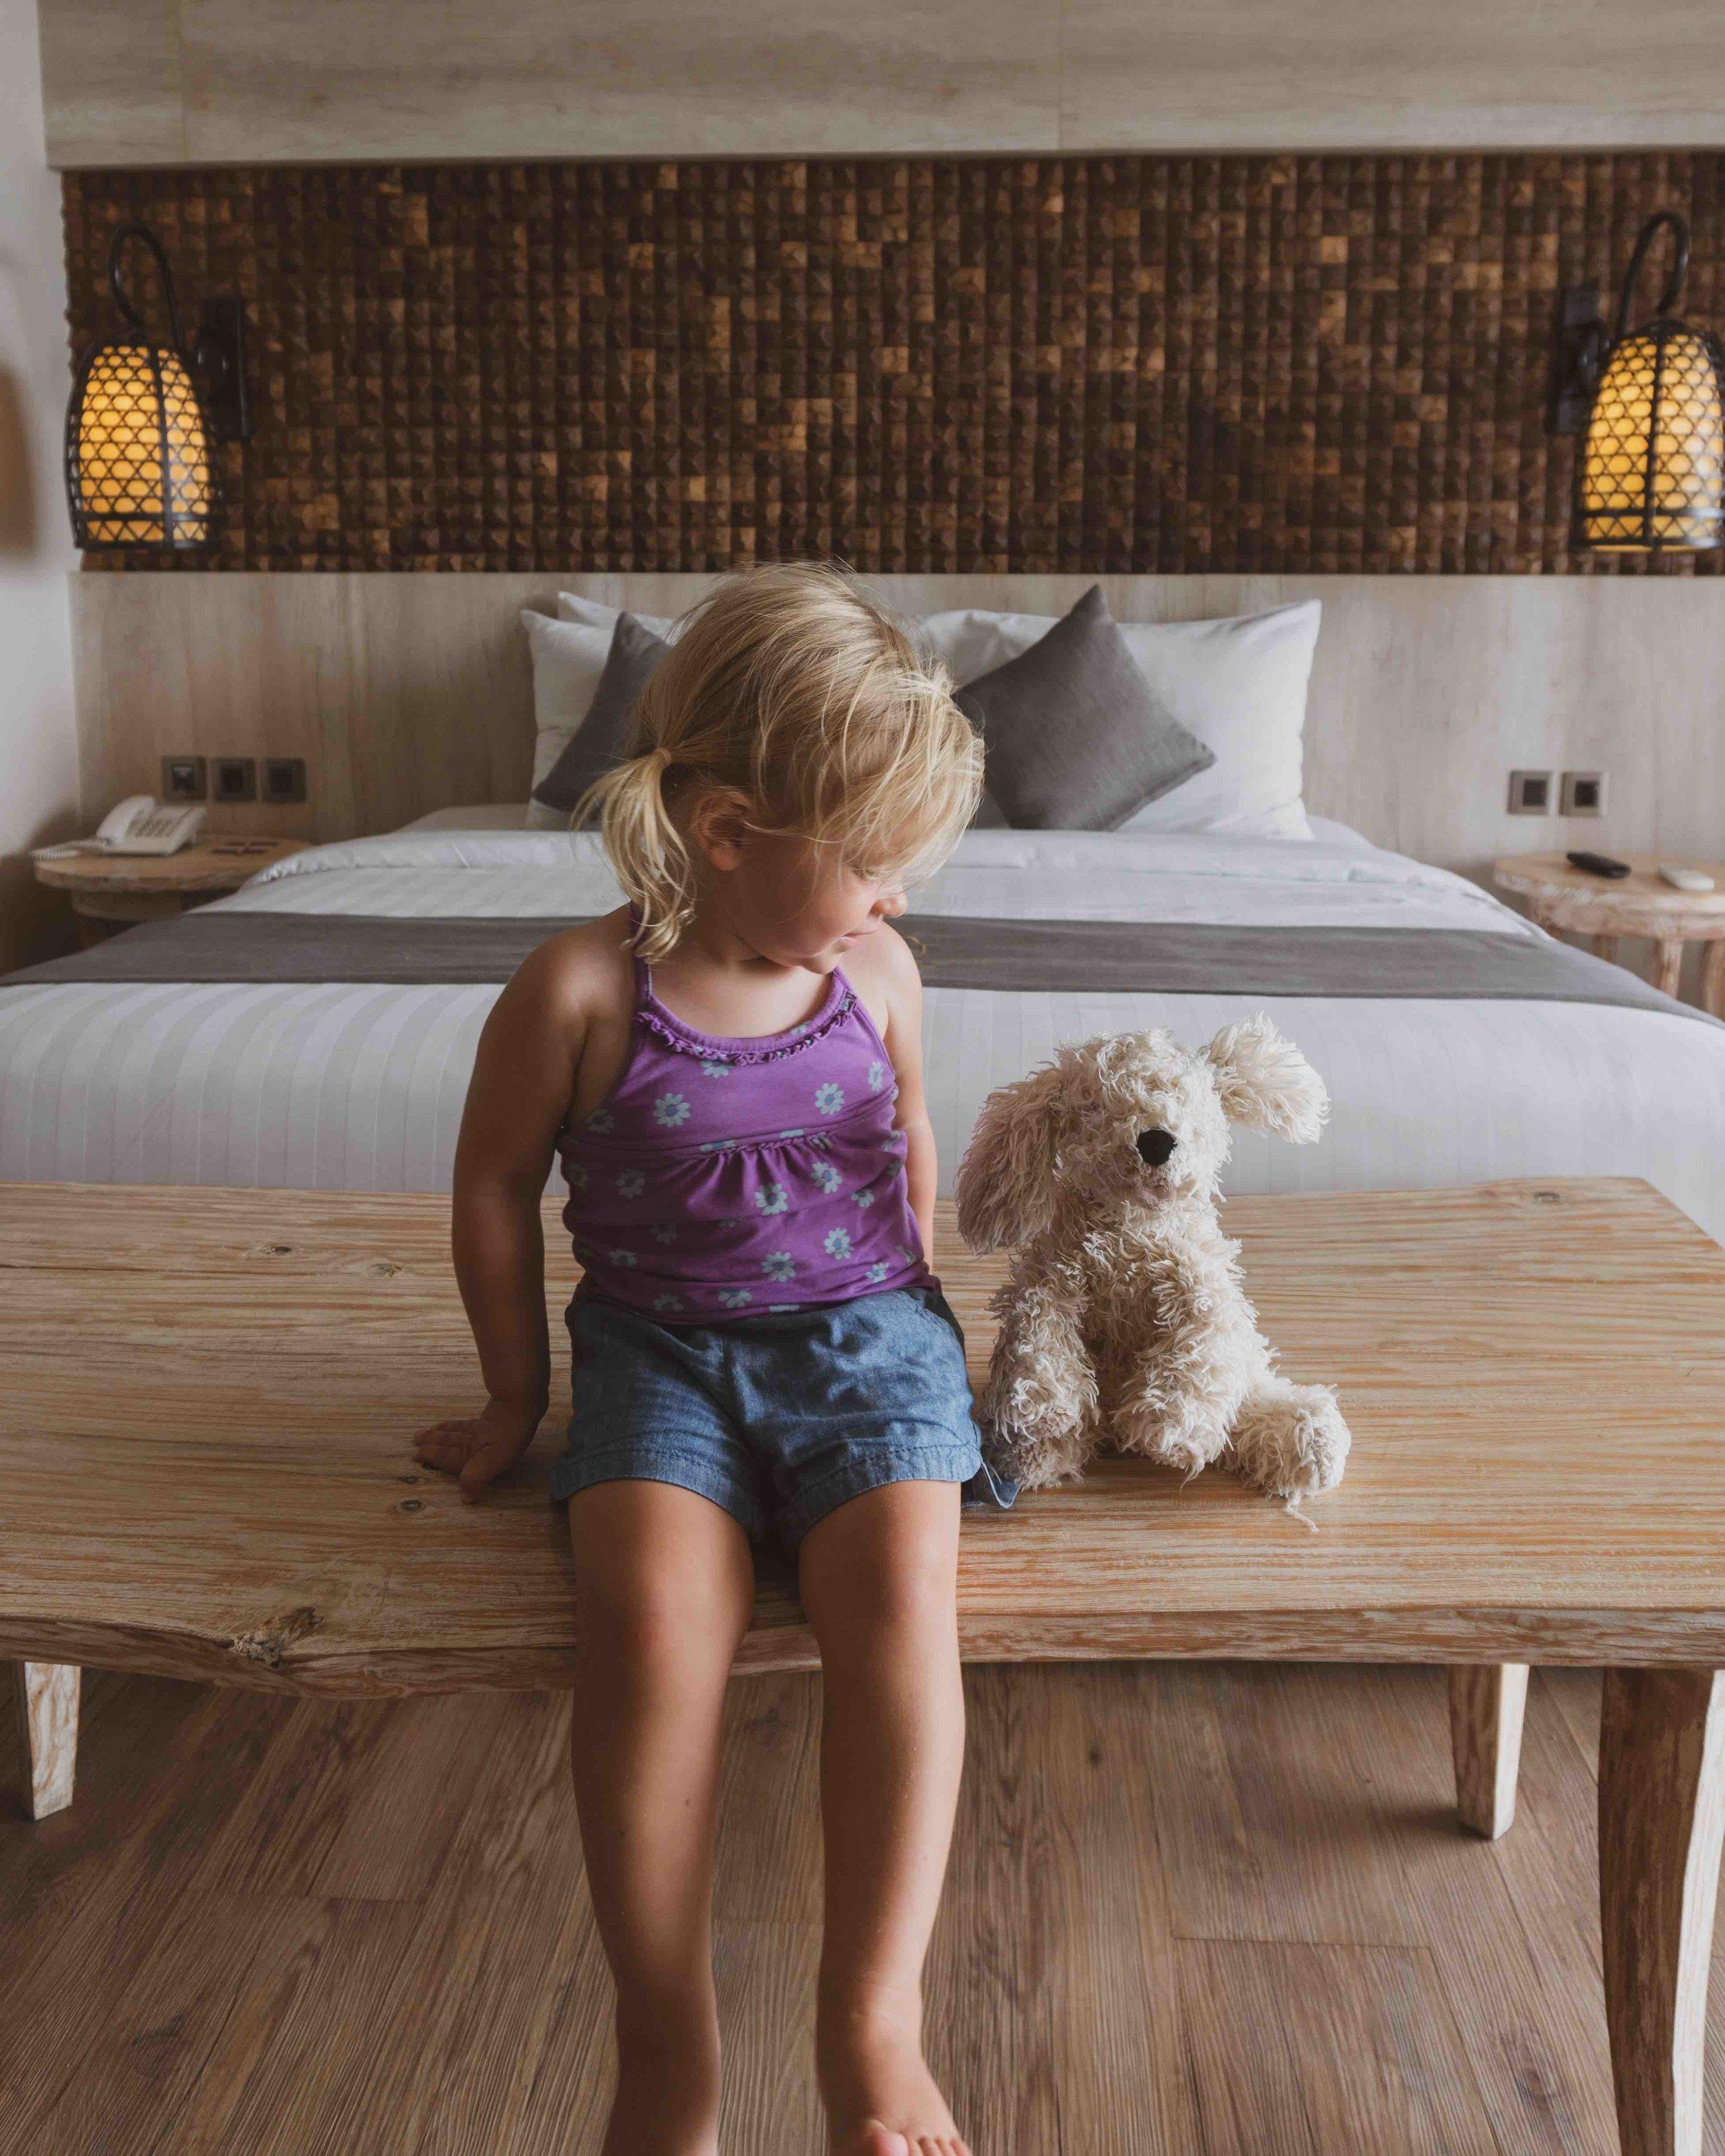 Jimbaran_Bali_family_hotel room_stylish space_bed_girl.jpg